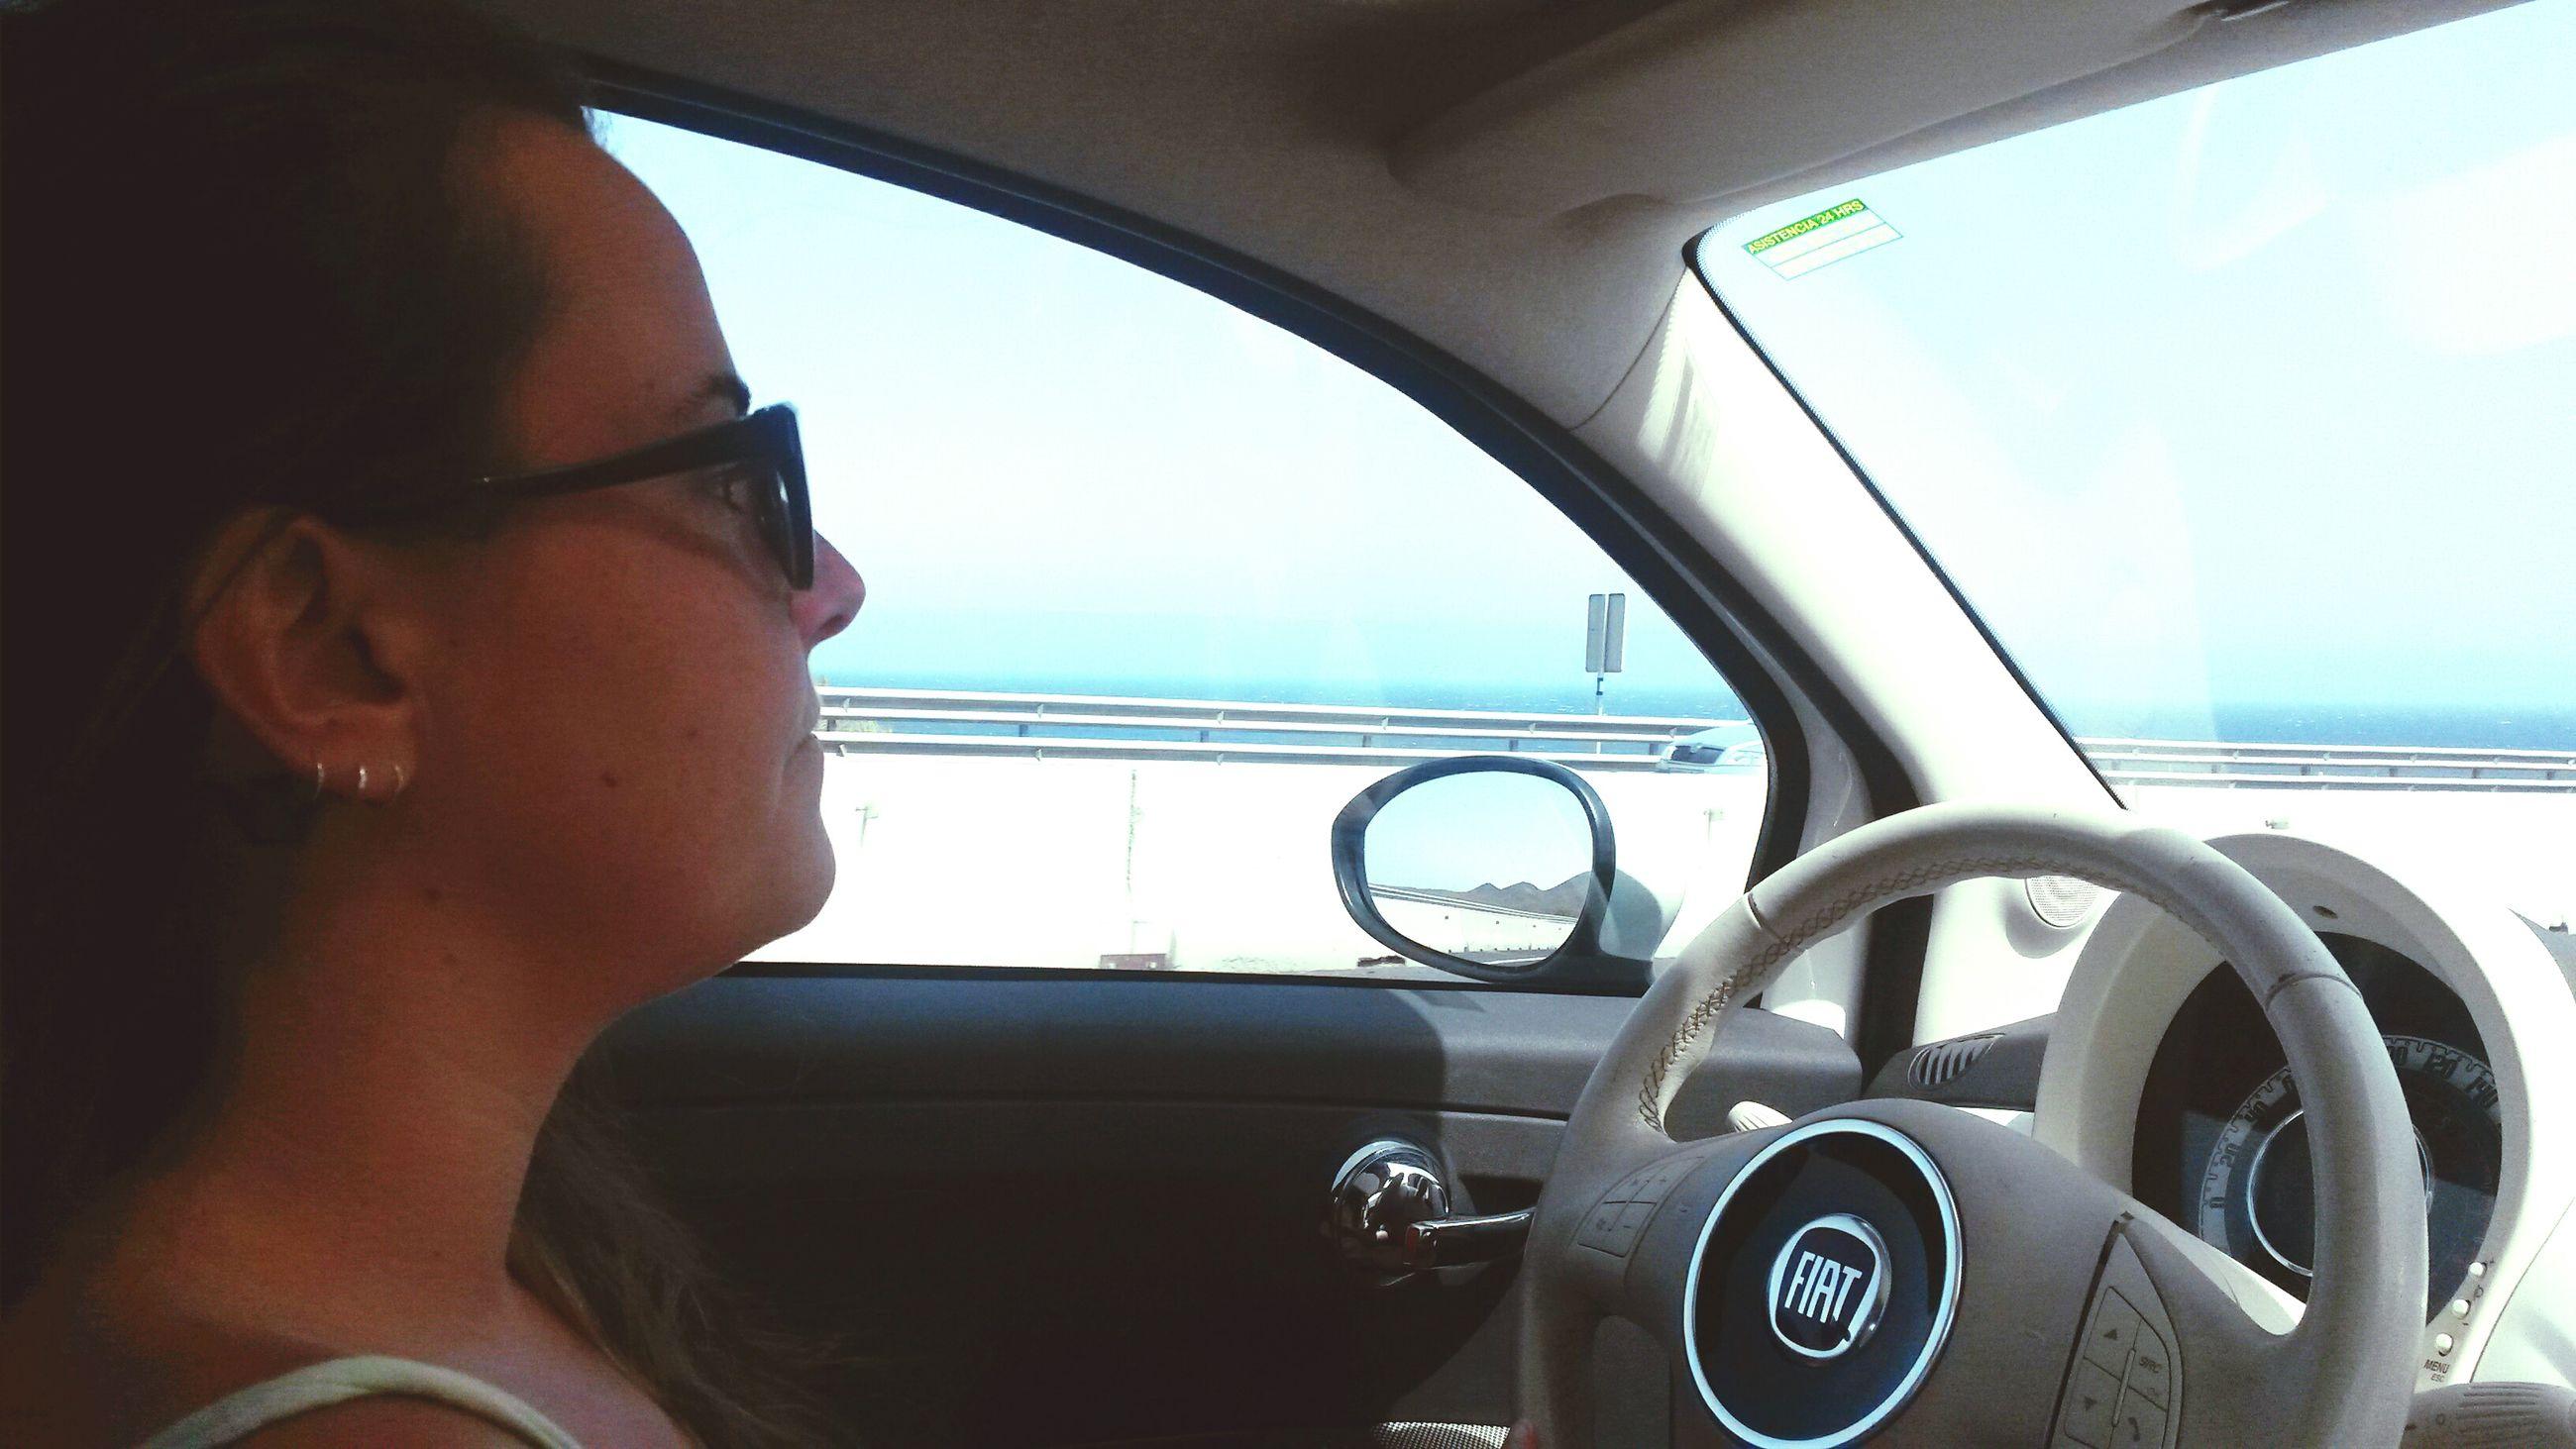 transportation, vehicle interior, mode of transport, window, indoors, travel, land vehicle, lifestyles, leisure activity, car interior, journey, car, transparent, glass - material, vehicle seat, headshot, reflection, sky